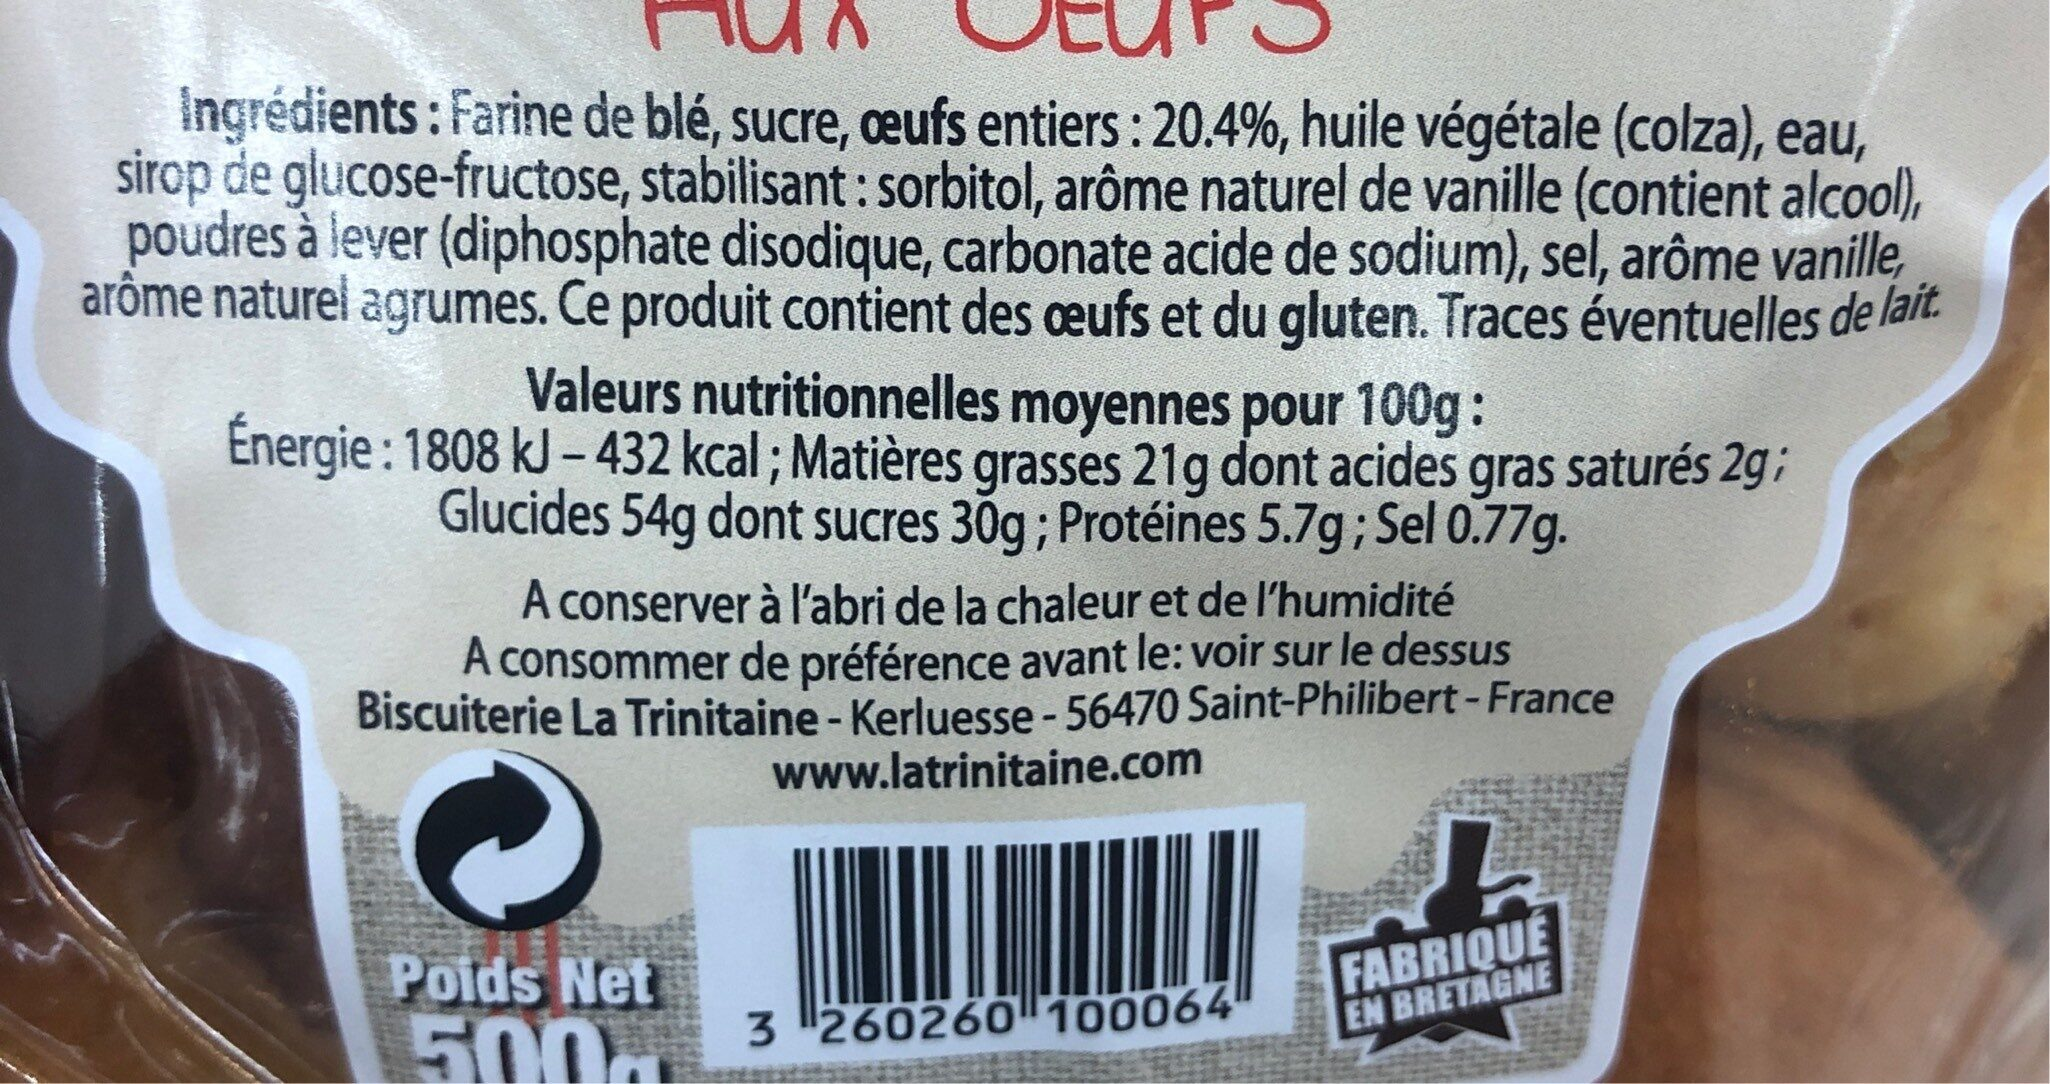 Madelaines aux oeufs - Informations nutritionnelles